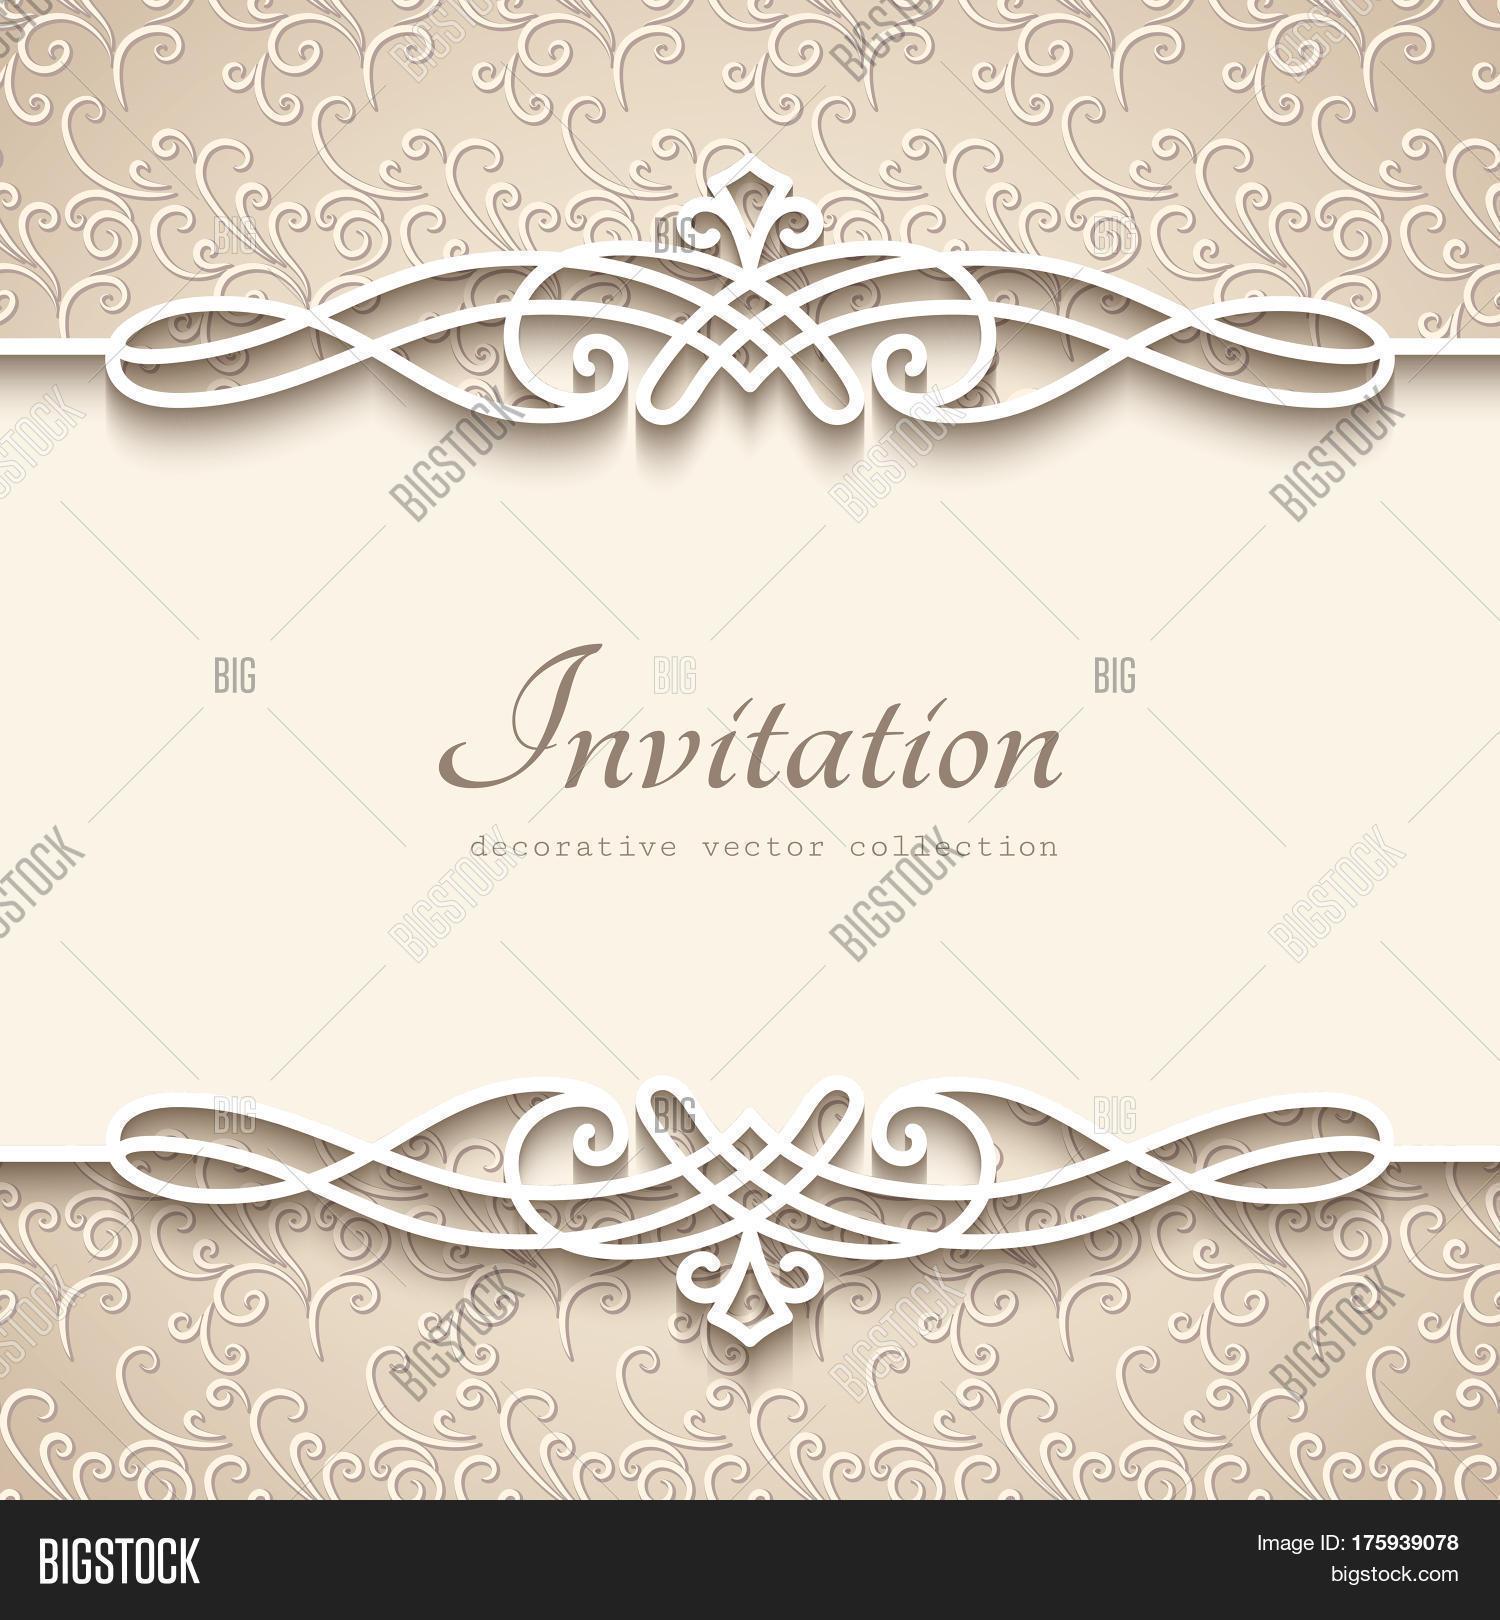 Vintage background cutout paper vector photo bigstock vintage background with cutout paper border decoration decorative flourish frame template wedding invitation or junglespirit Image collections